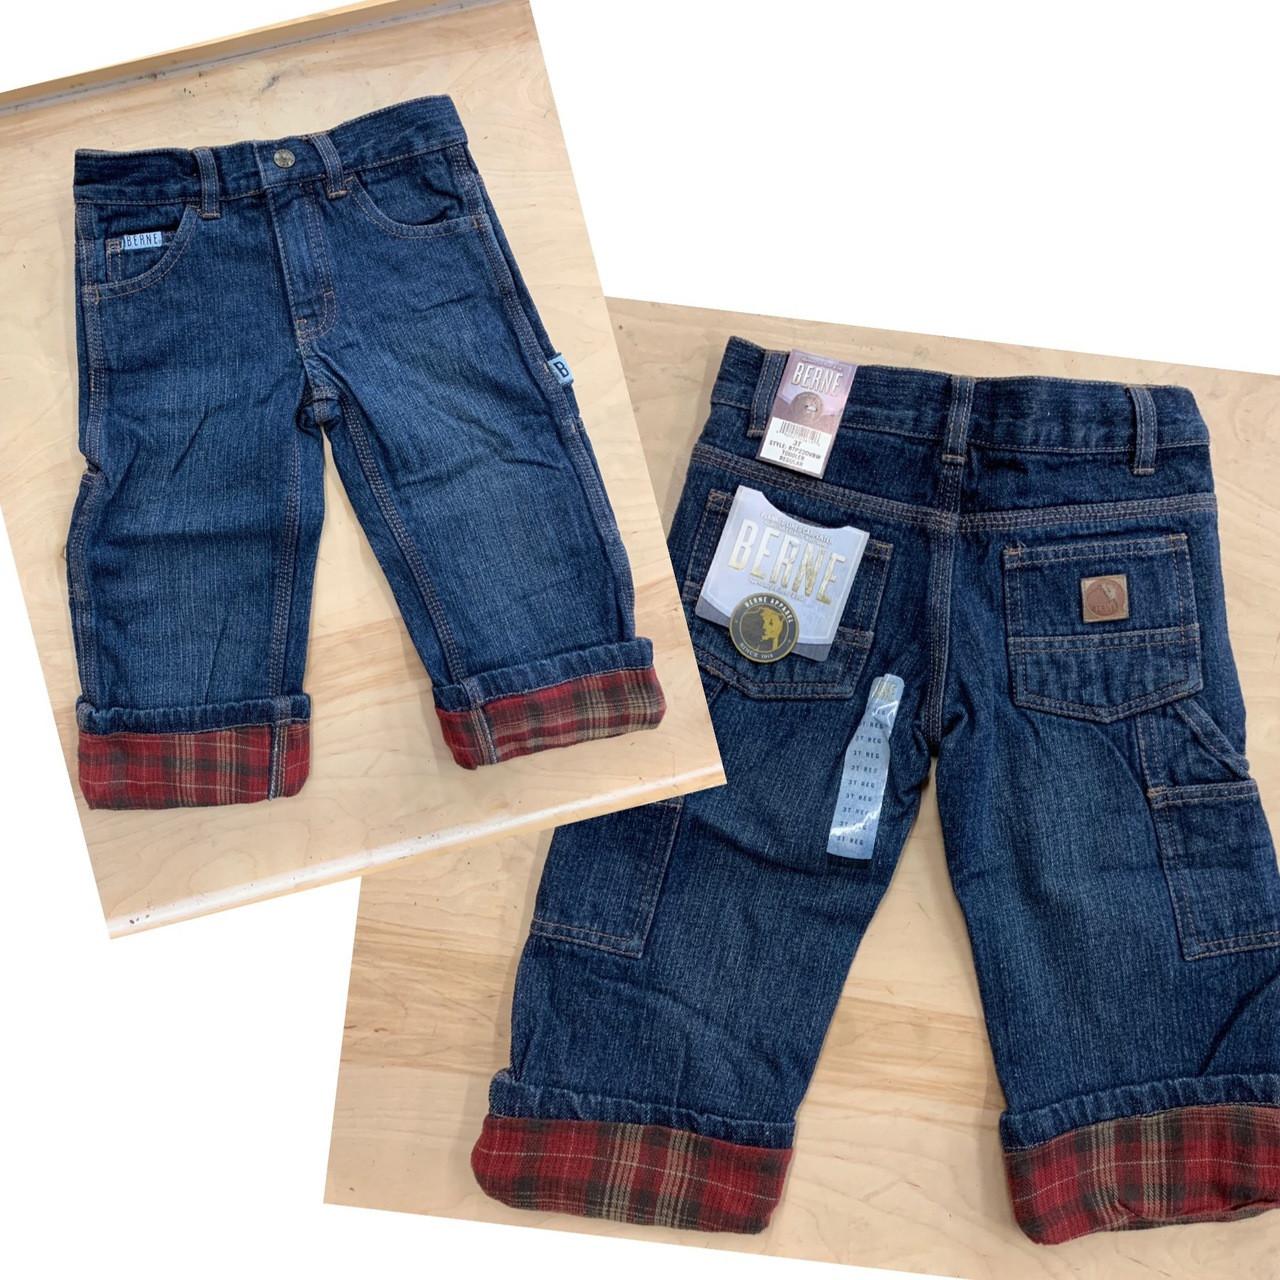 5fecae59 Berne Denim Flannel Lined Carpenter Jeans - Shelton's Clothing & Outdoors